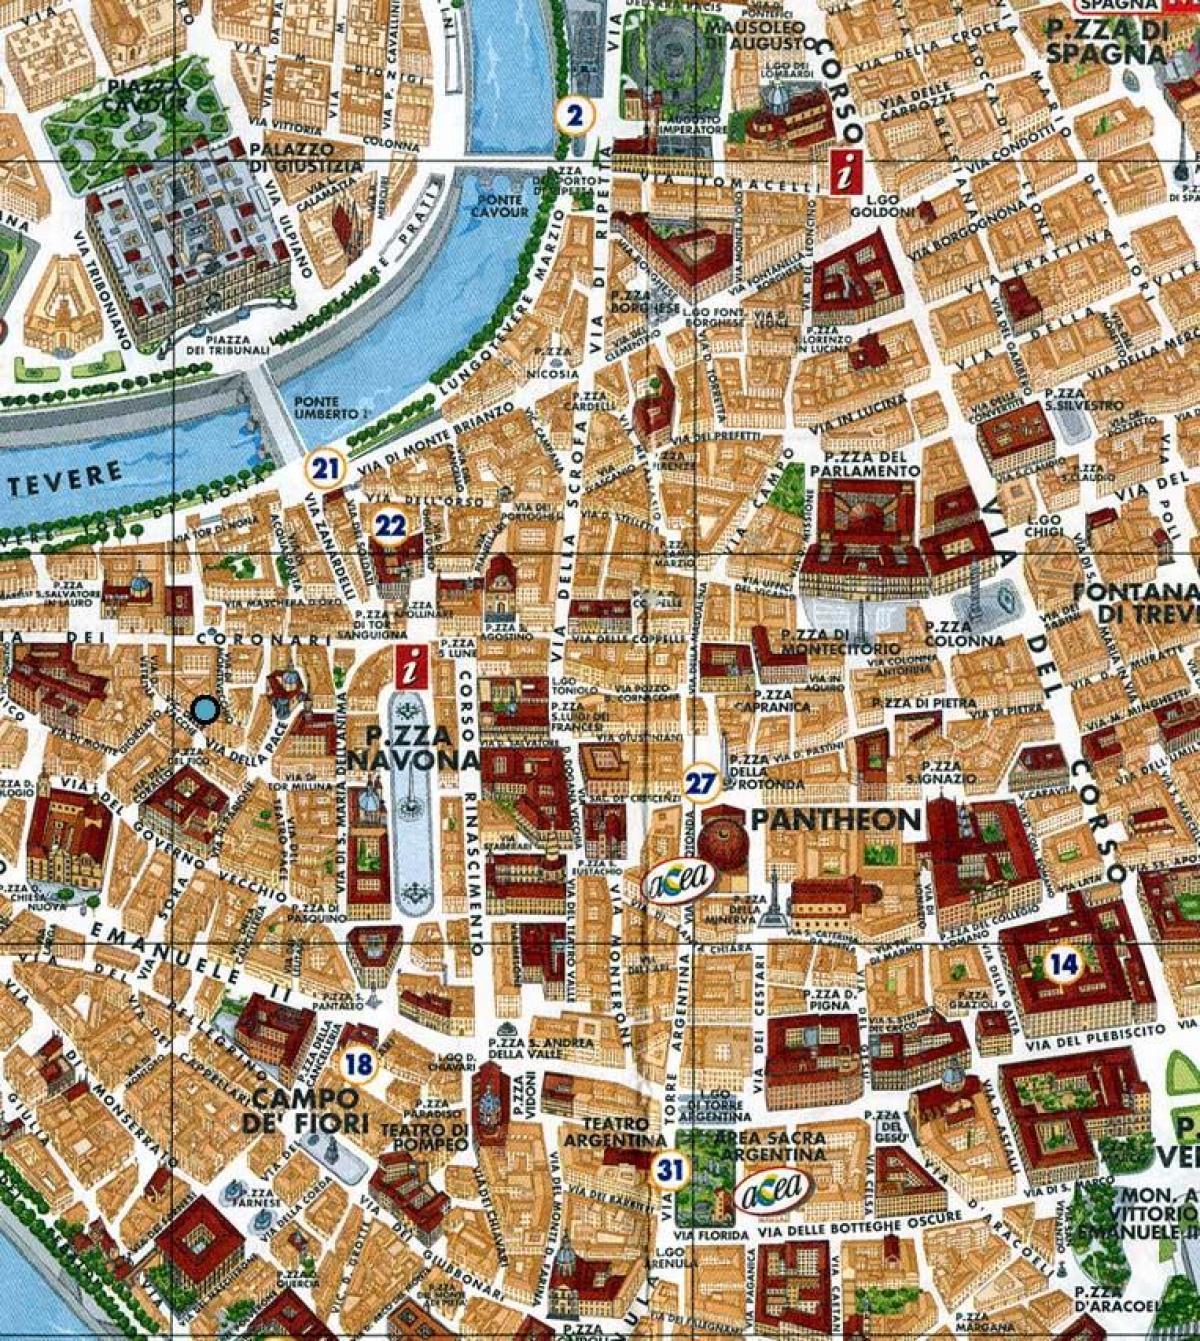 Cartina Roma Piazza Navona.Piazza Navona Roma Mappa Mappa Di Roma Piazza Navona Lazio Italia